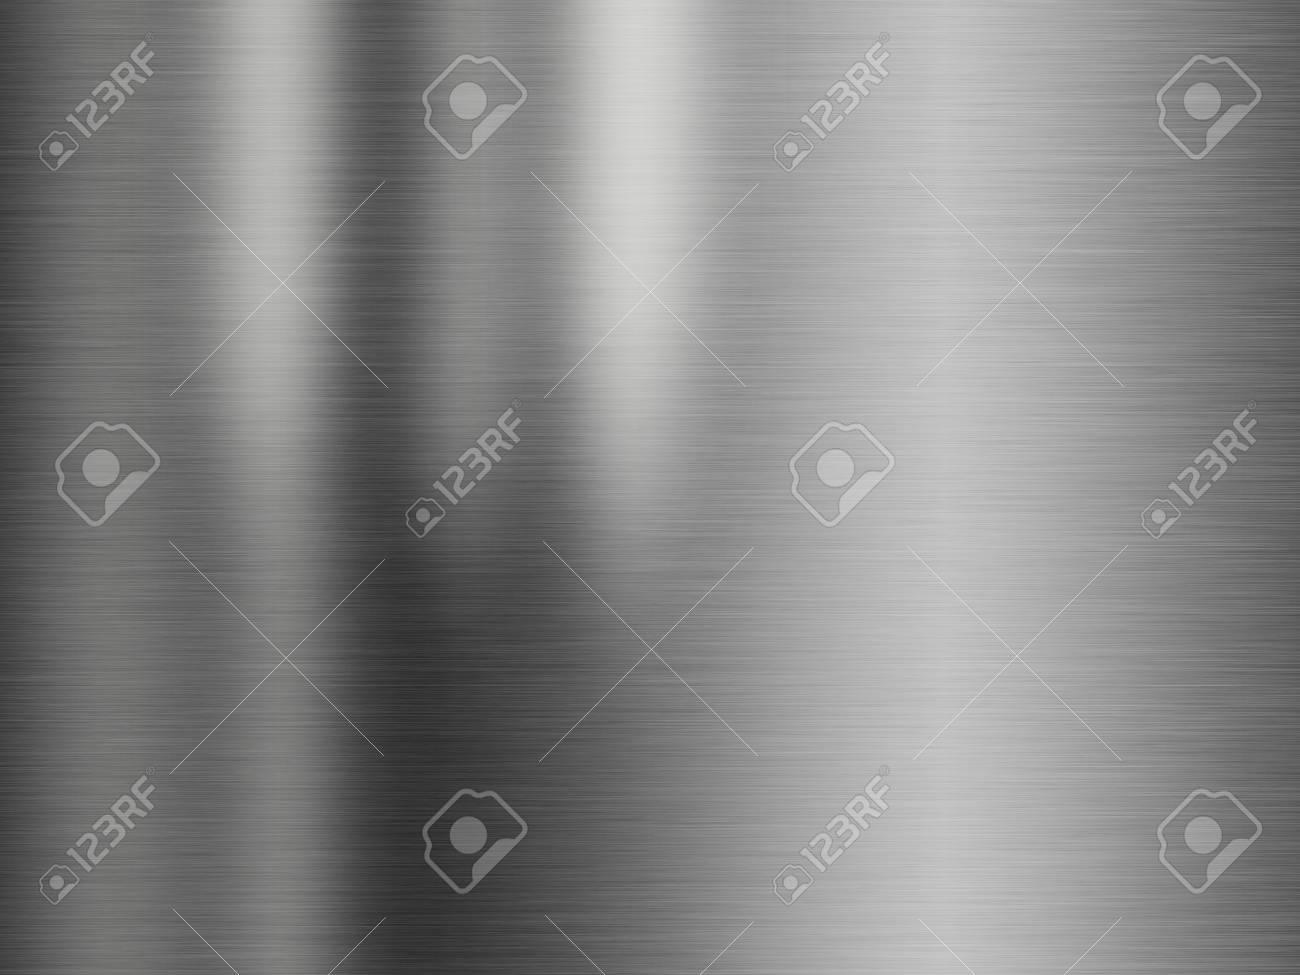 texture en acier inoxydable ou en métal texture de fond Banque d'images - 75076719